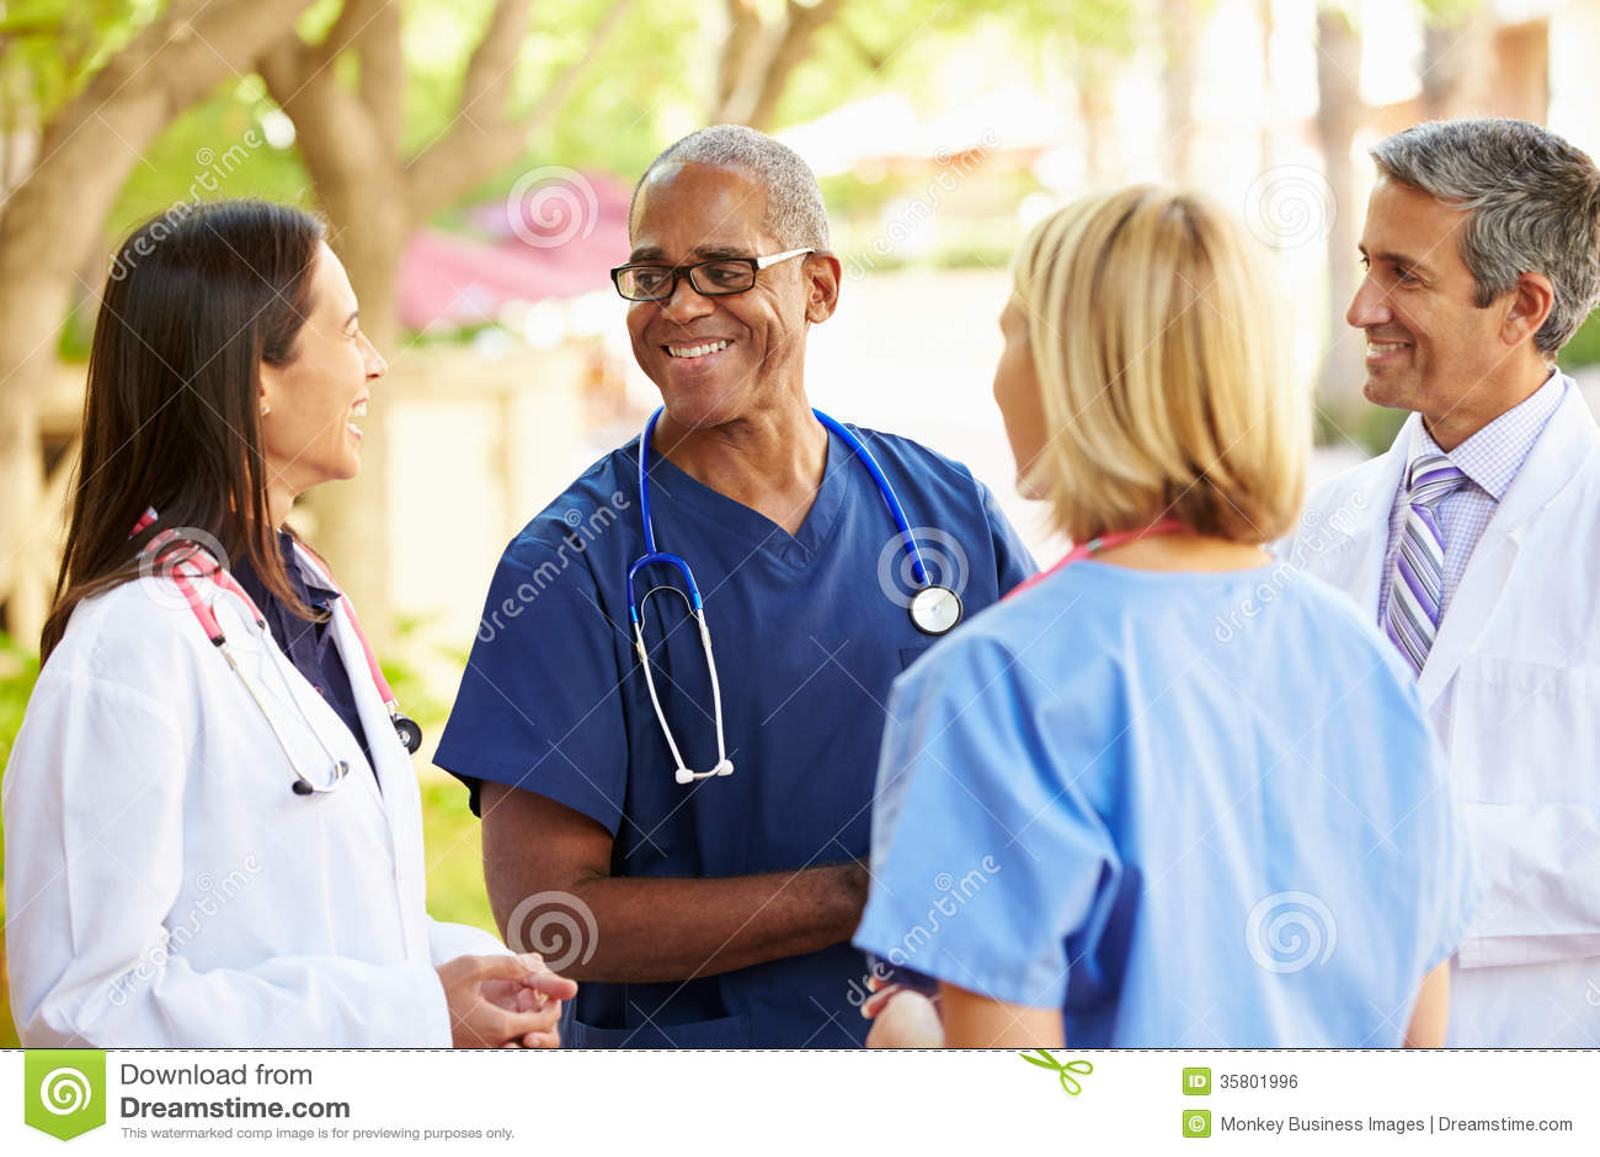 Team Having Discussion Outdoors médico